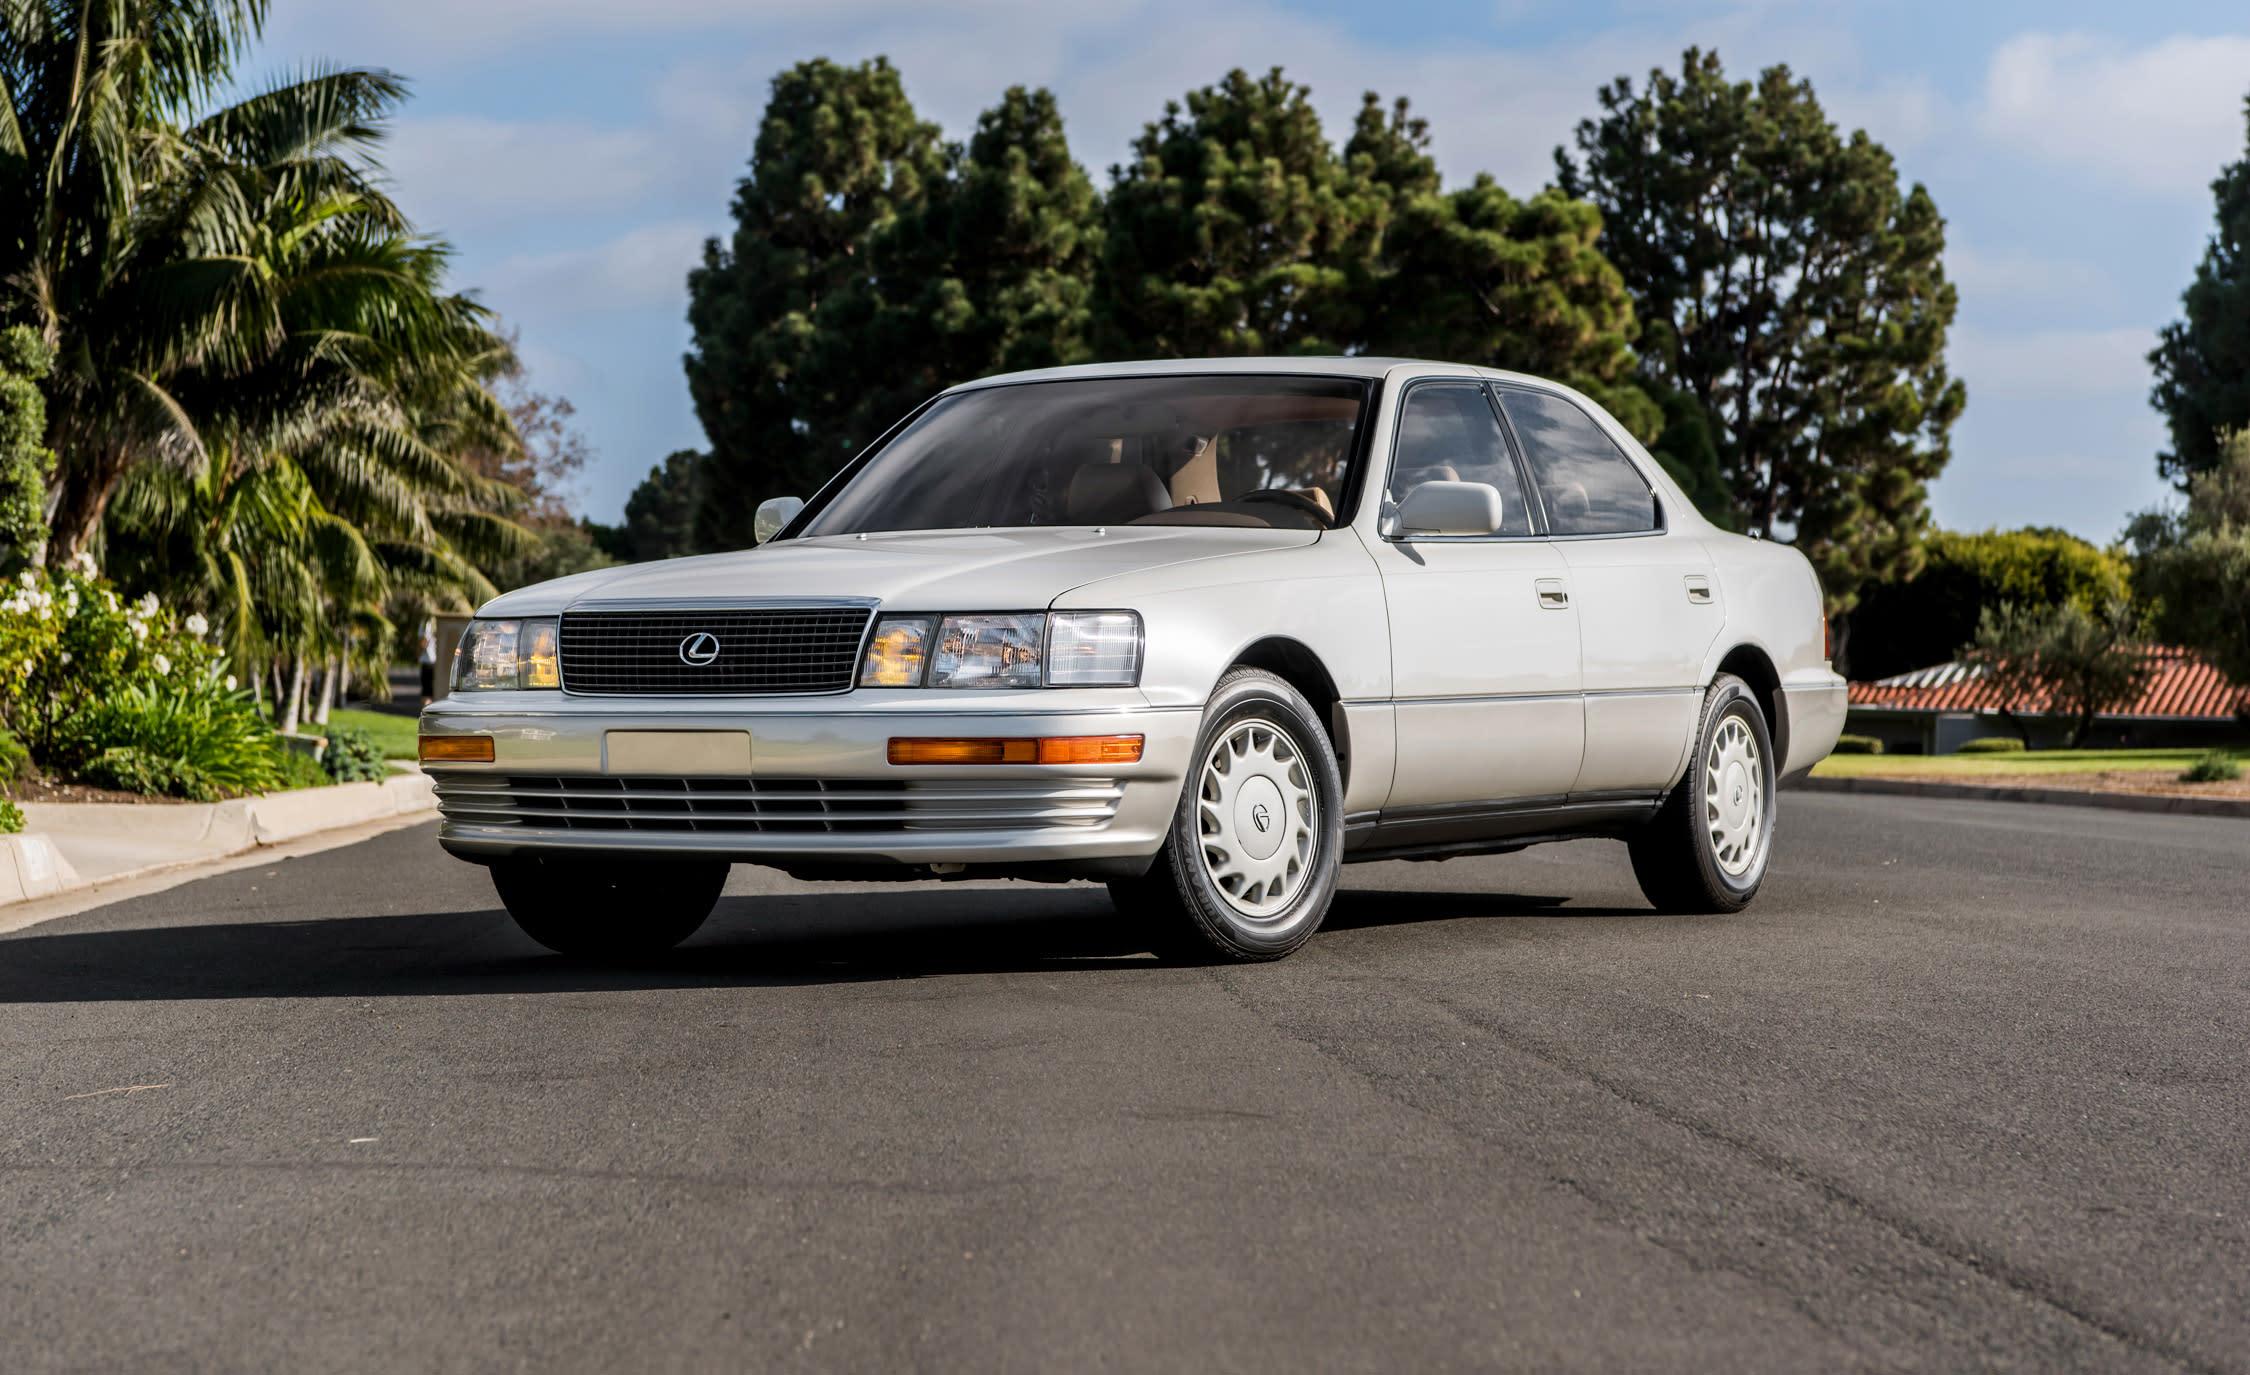 Luxury Japan Style Revisiting The Original Lexus Ls400